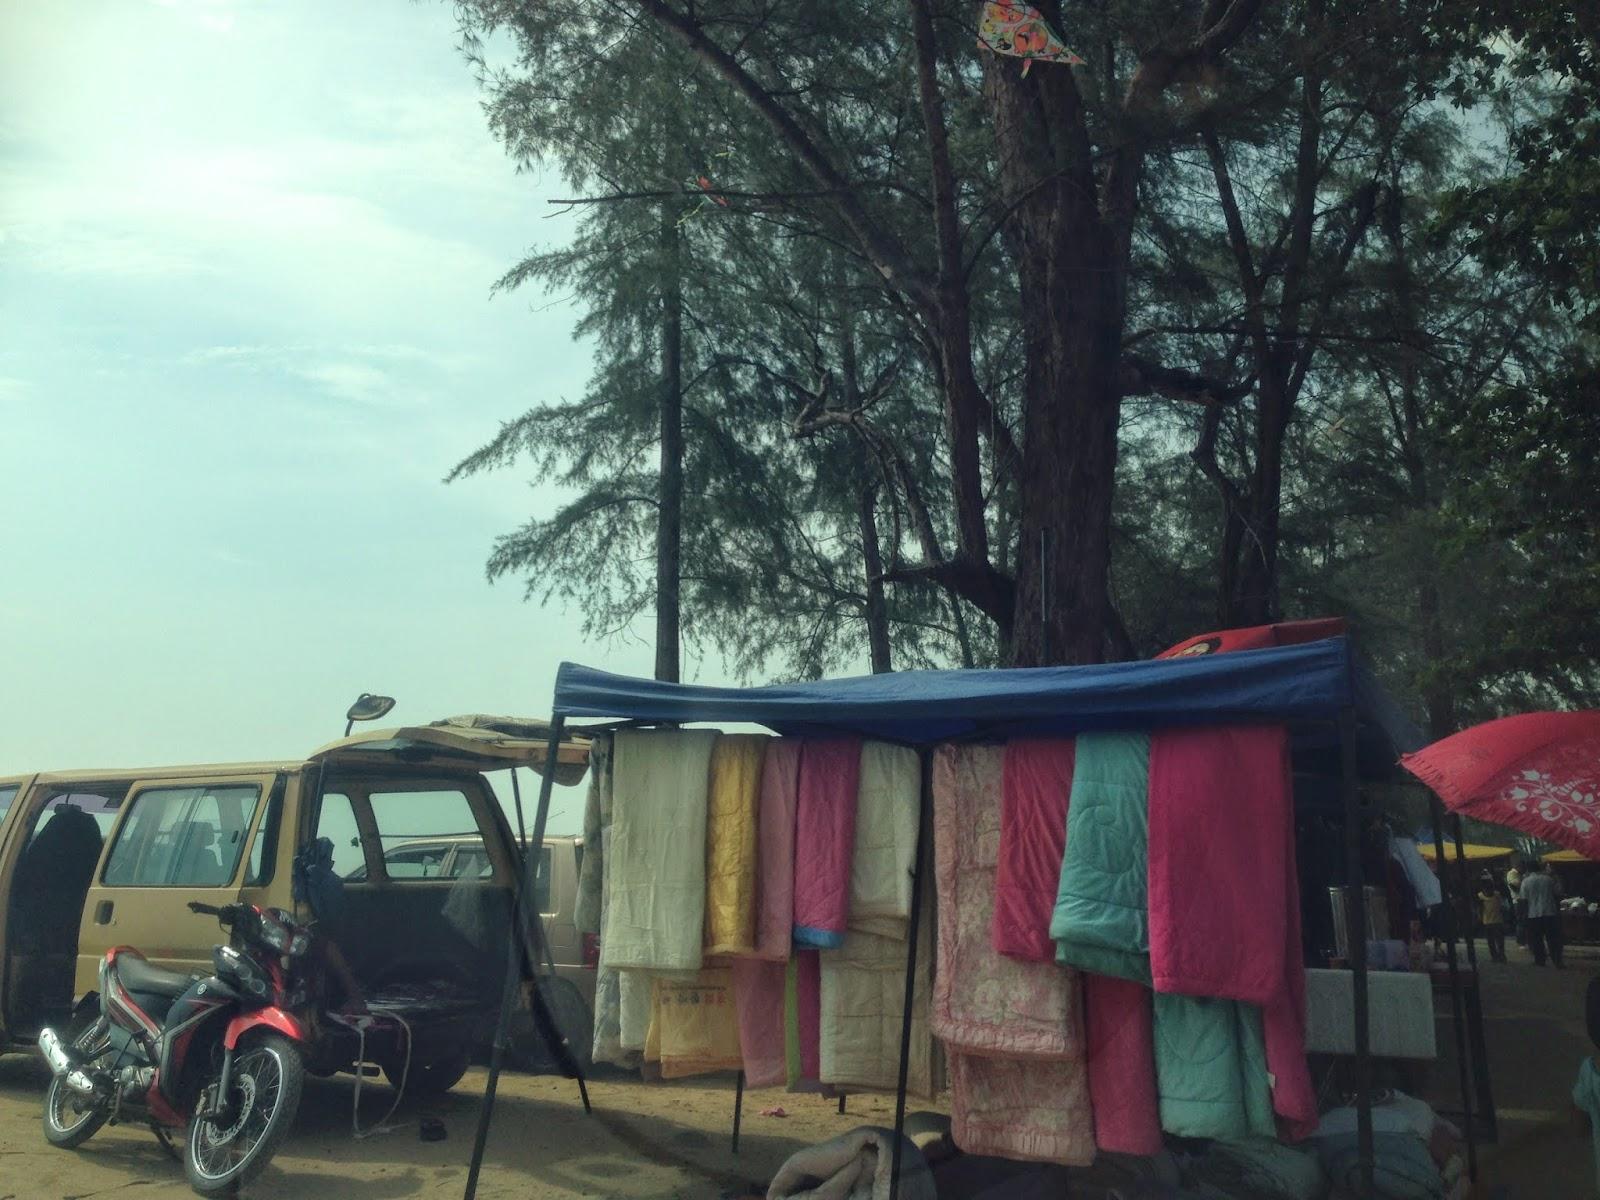 Pantai Irama vendors